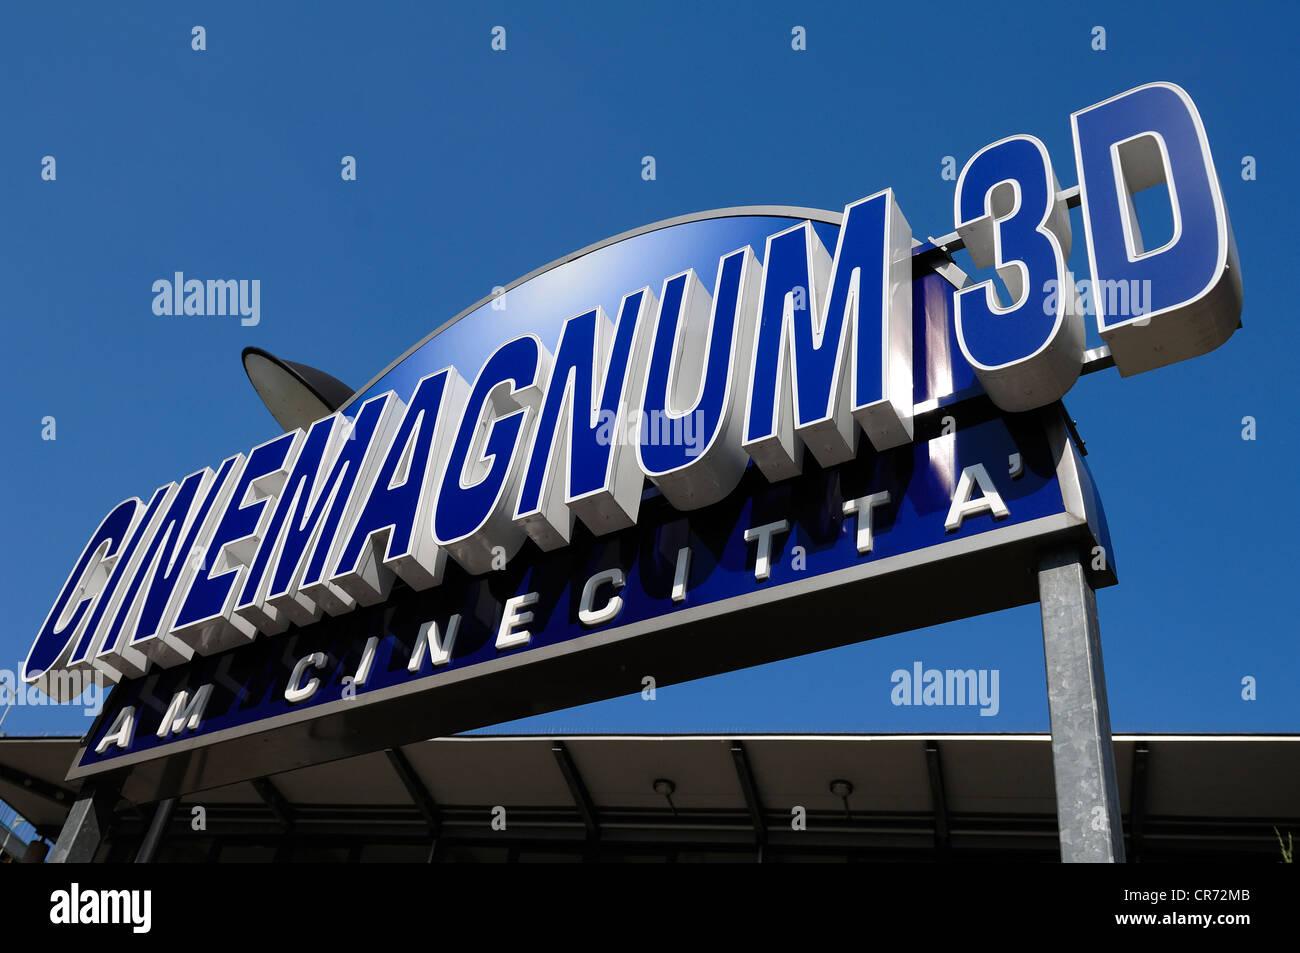 Advertising sign, Cinemagnum 3D cinema, Gewerbemuseumsplatz 3, Nuremberg, Middle Franconia, Bavaria, Germany, Europe - Stock Image